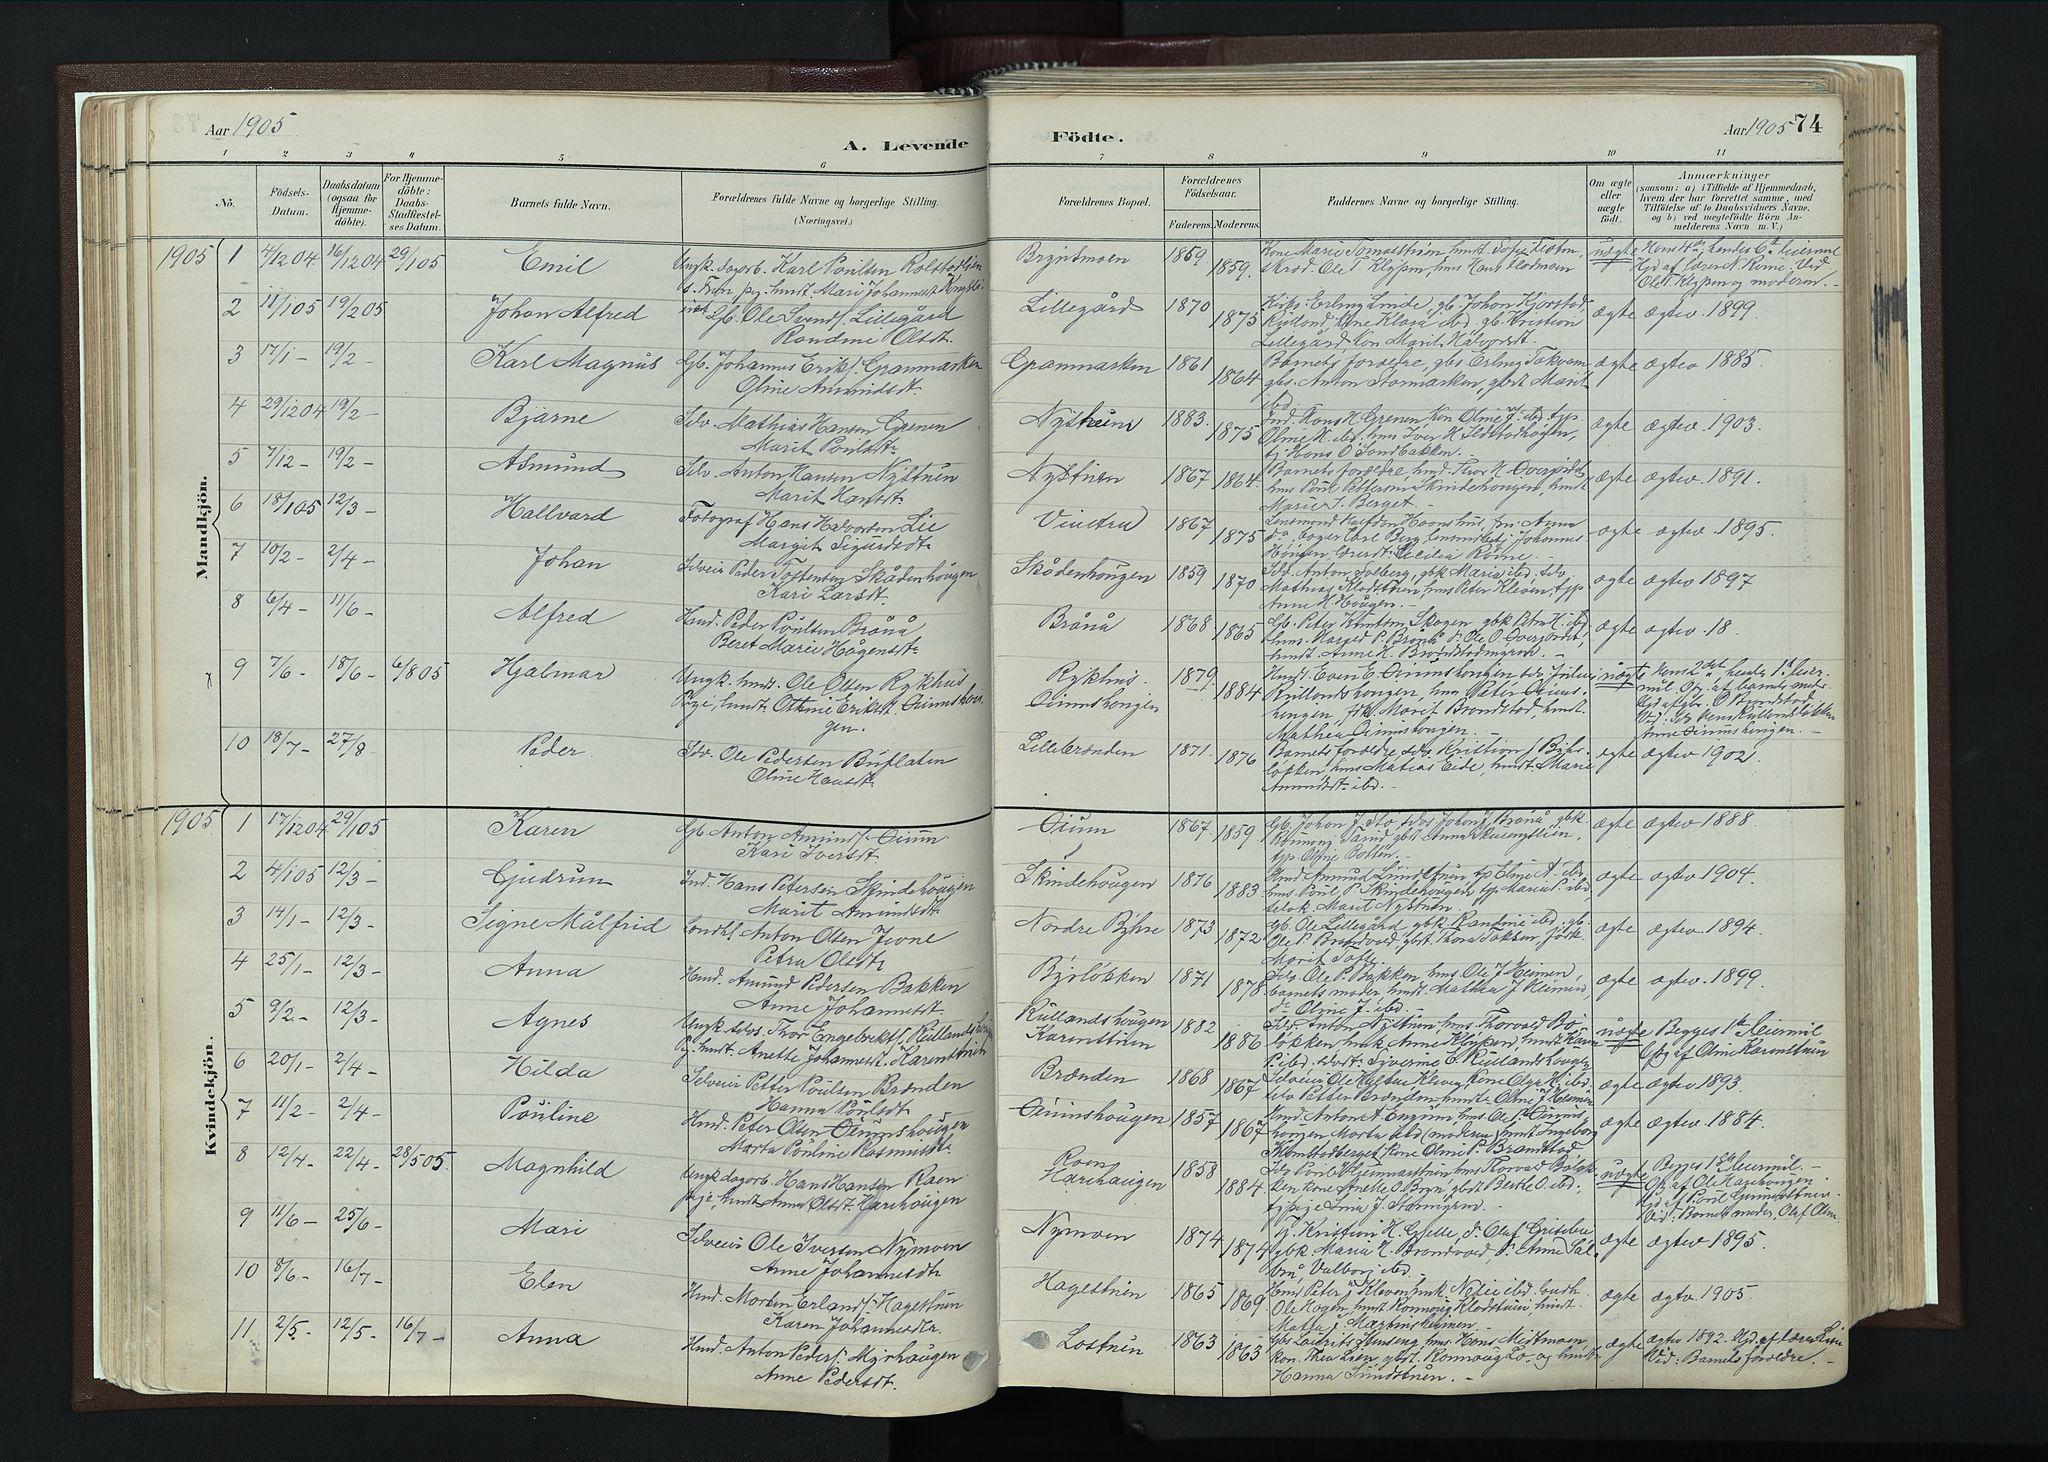 SAH, Nord-Fron prestekontor, Ministerialbok nr. 4, 1884-1914, s. 74